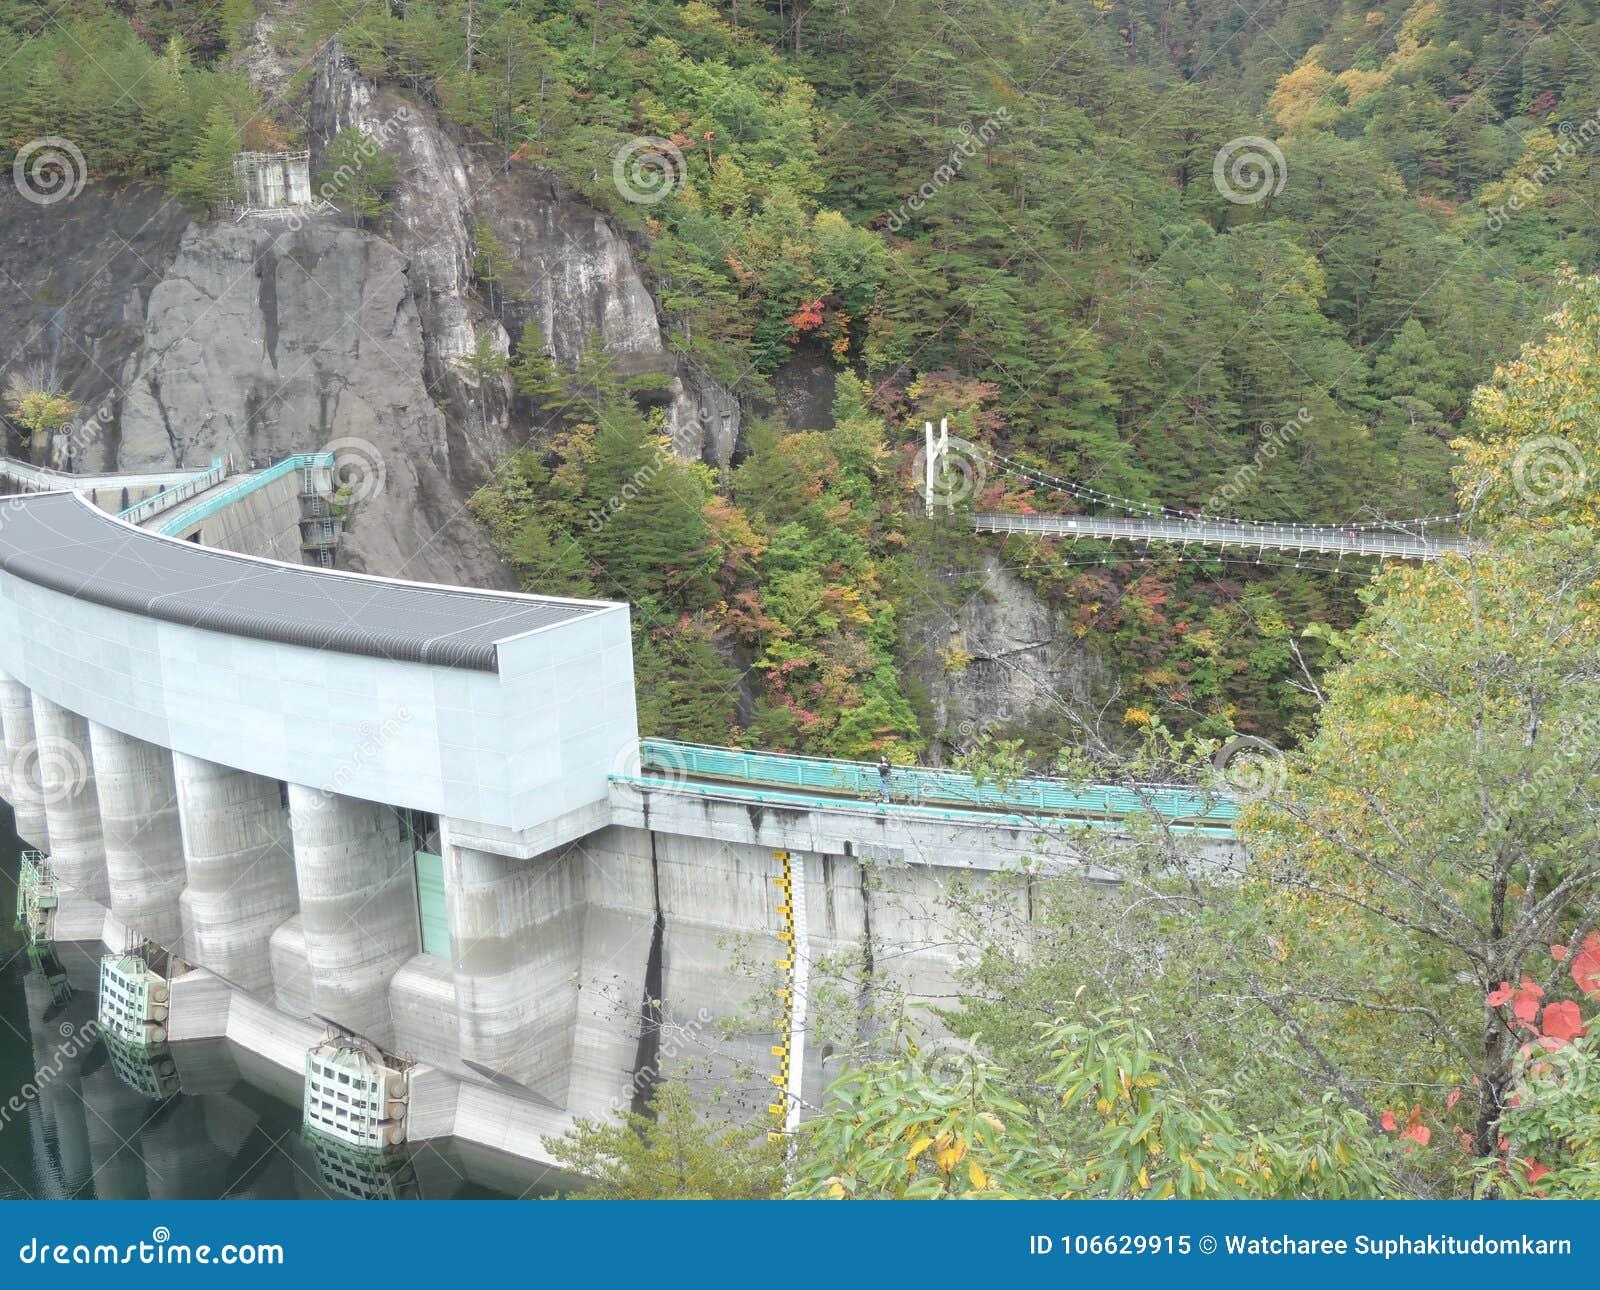 Kawamatadam en Hangbrug bij setoai-Kyocanion in Japan